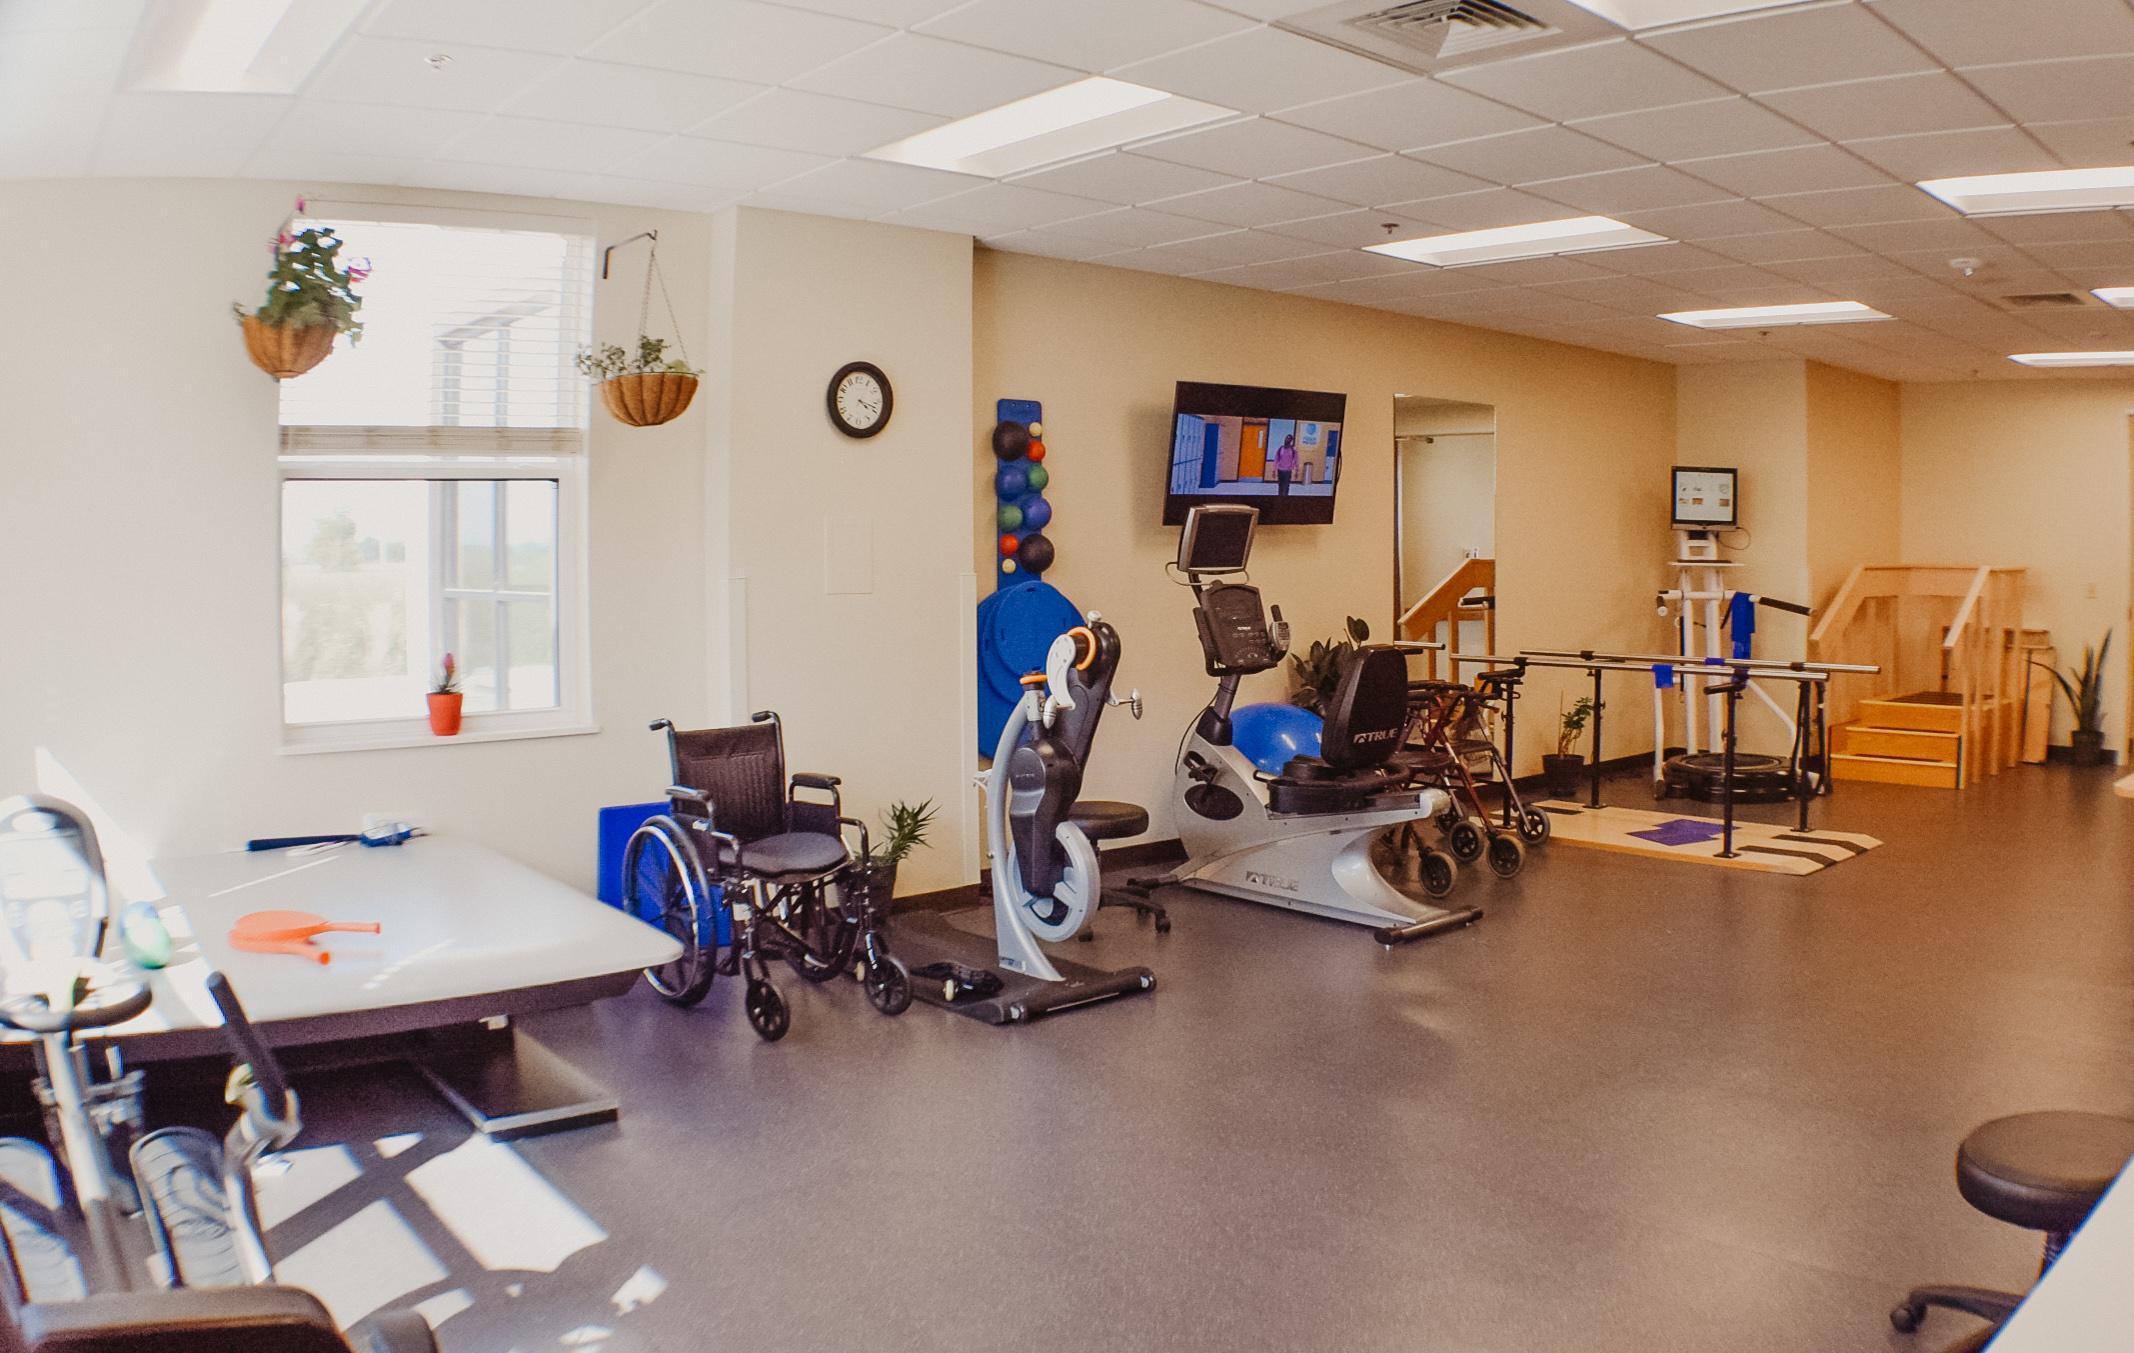 serenity healthcare serenity rehabilitation and care center twin falls idaho senior living twin falls